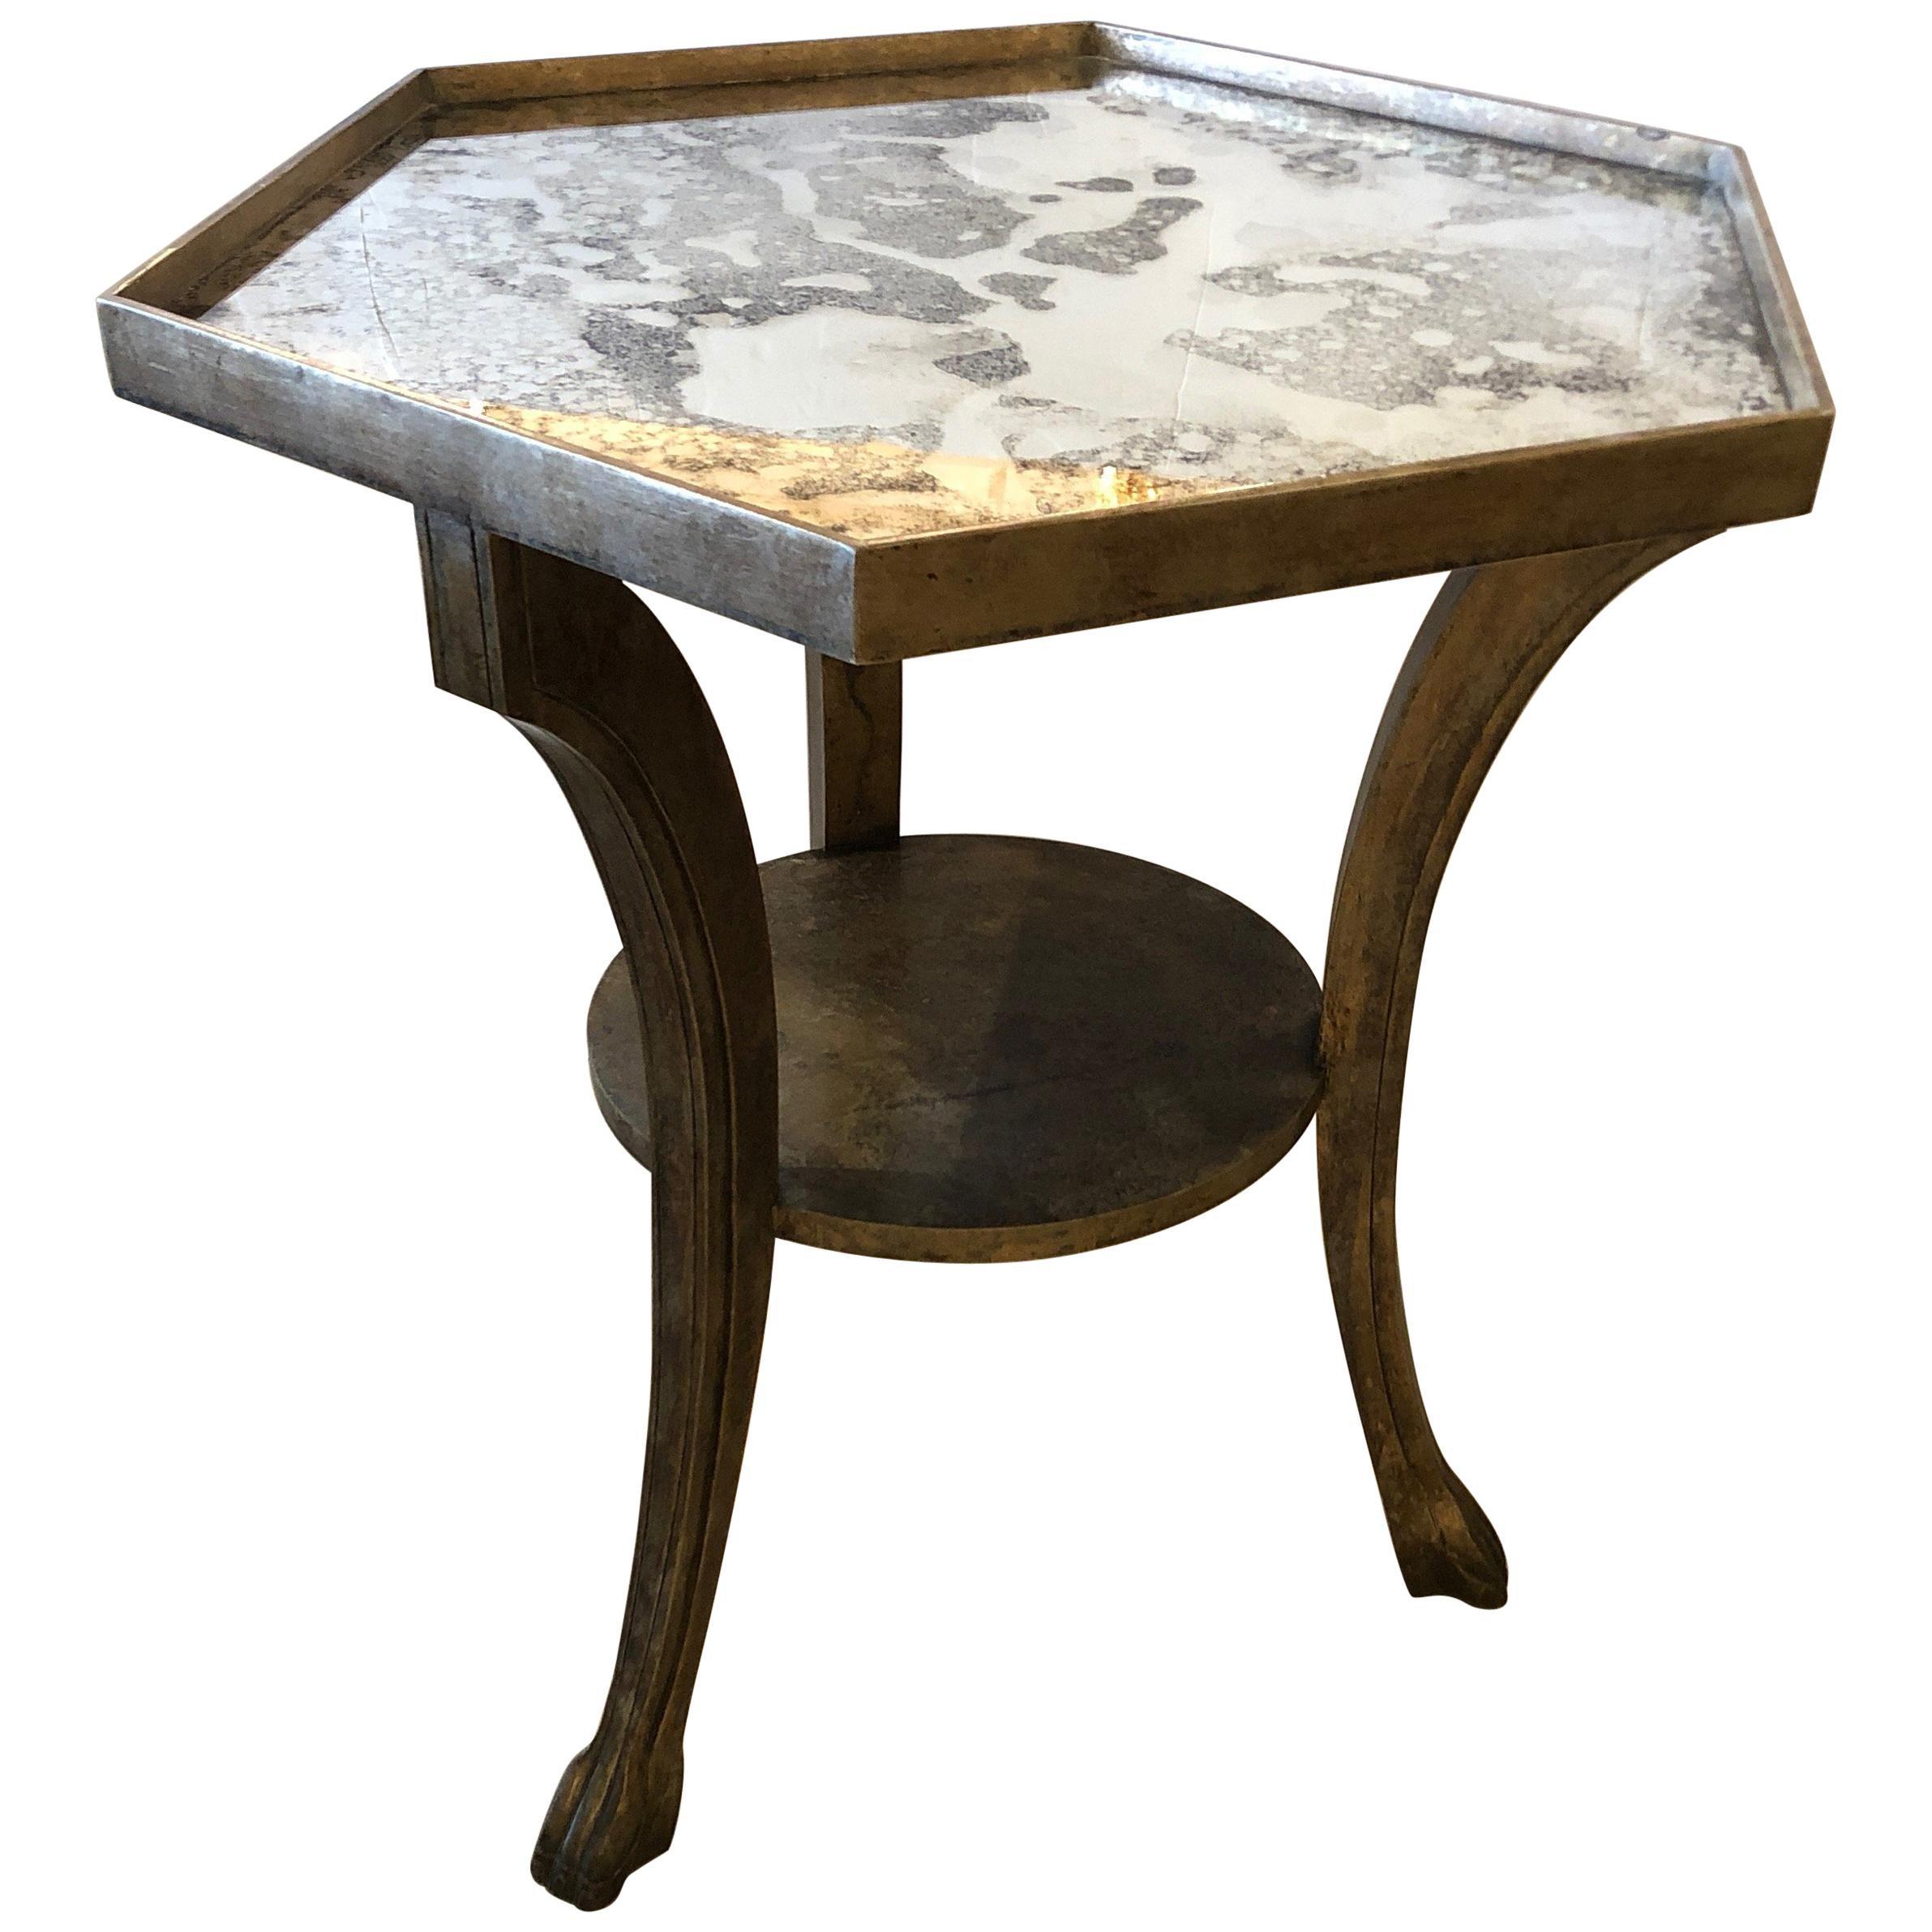 Designer Niermann Weeks Hexagonal Silvergilt Mirrored Side End Or Center Table